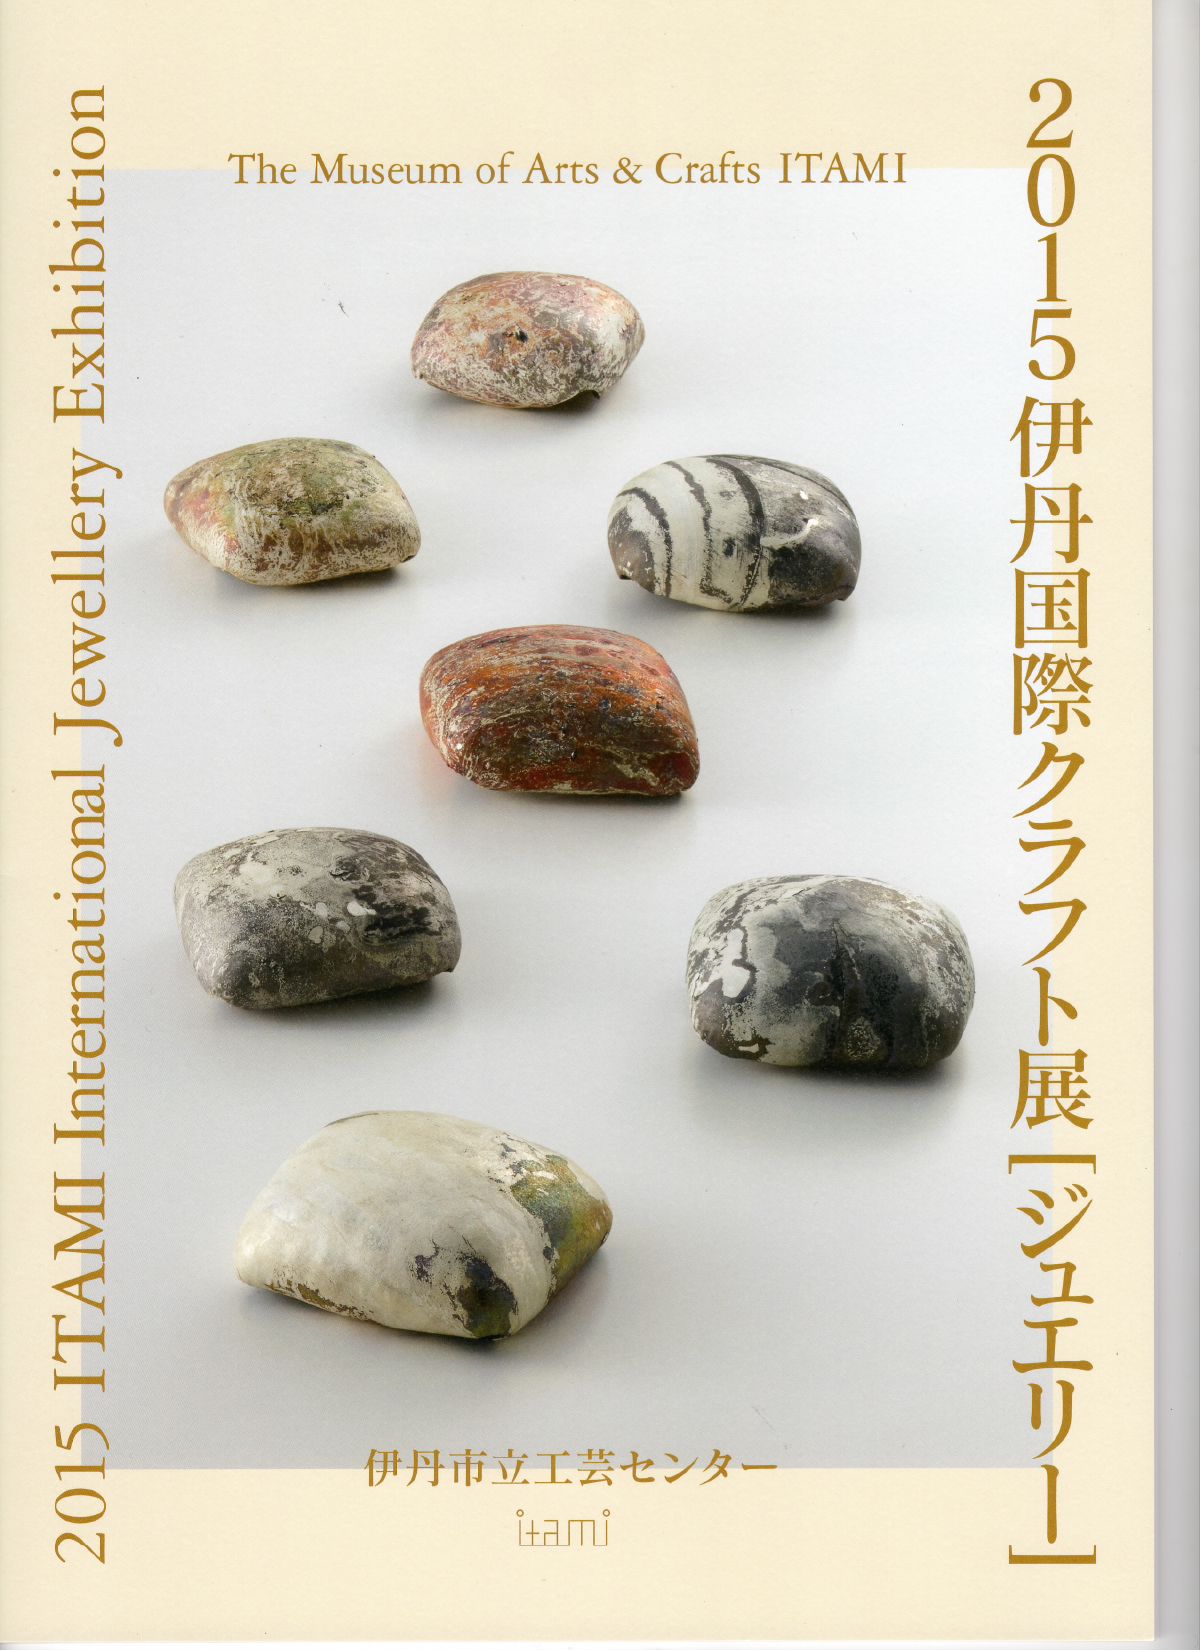 ITAMI 2015 catalogue-1.jpg